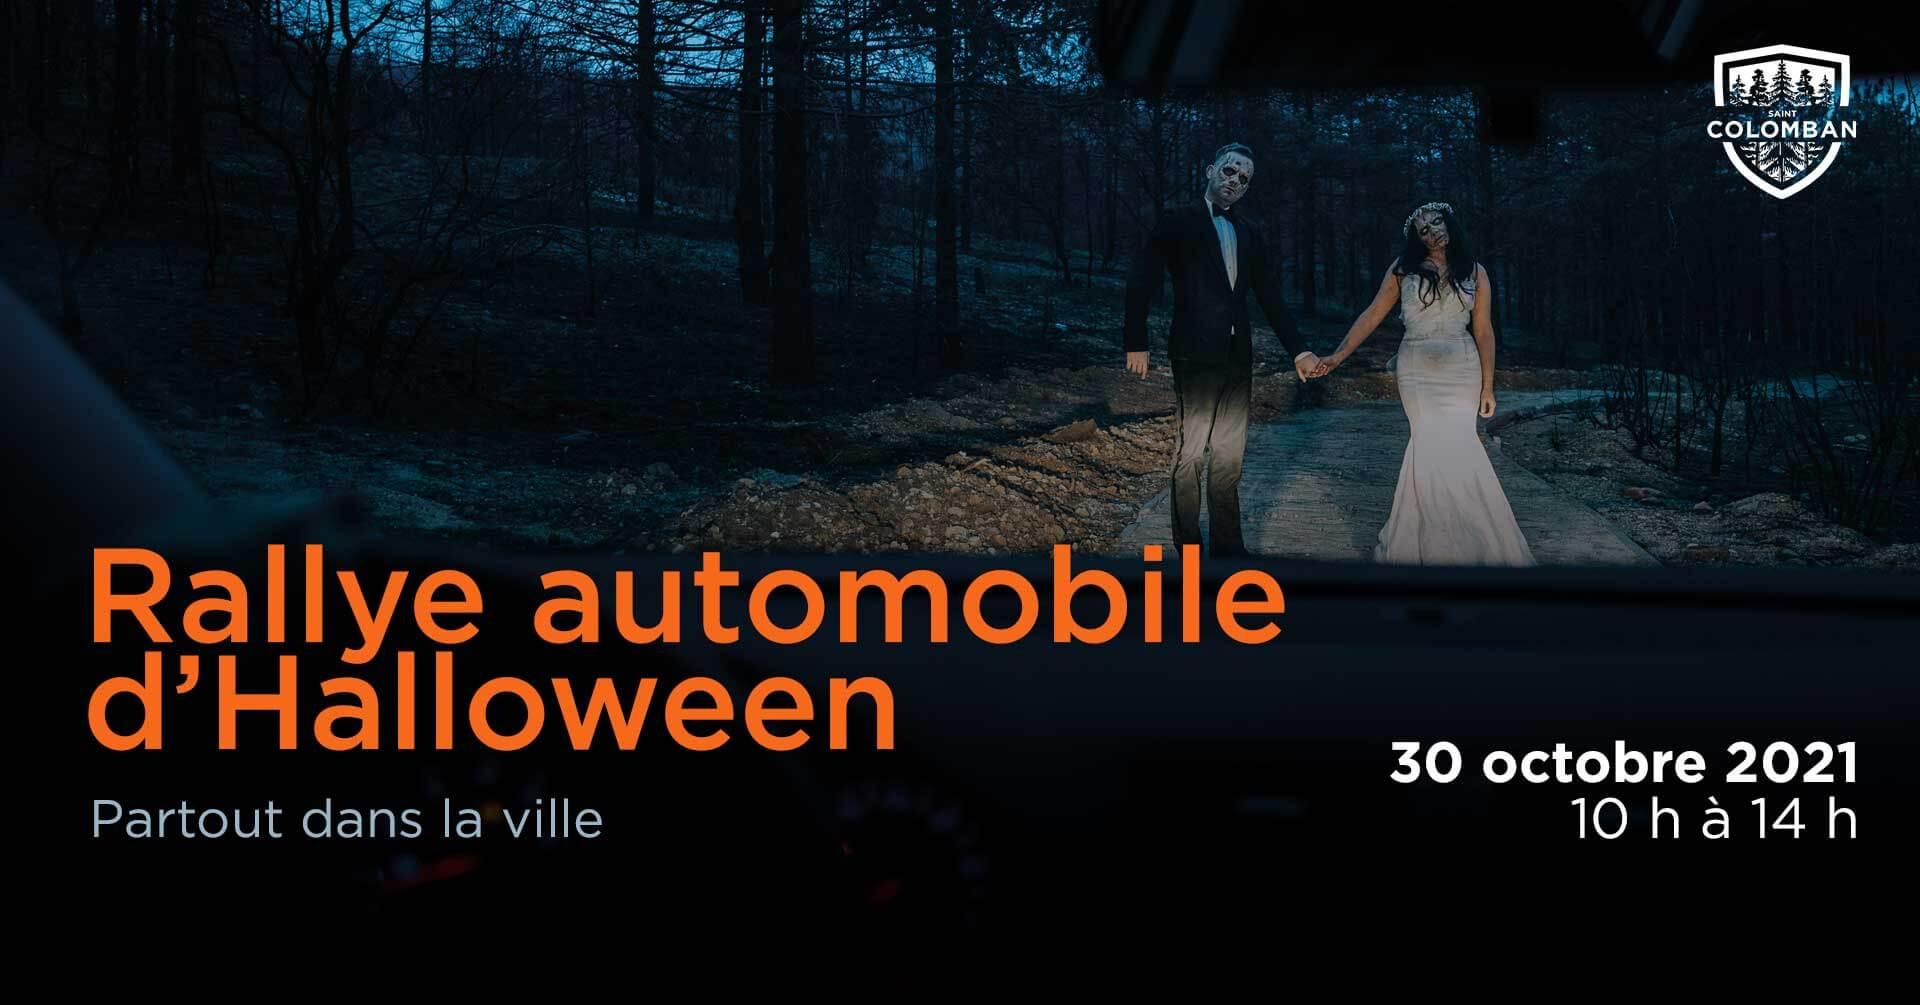 Rallye automobile d'Halloween Gratuit